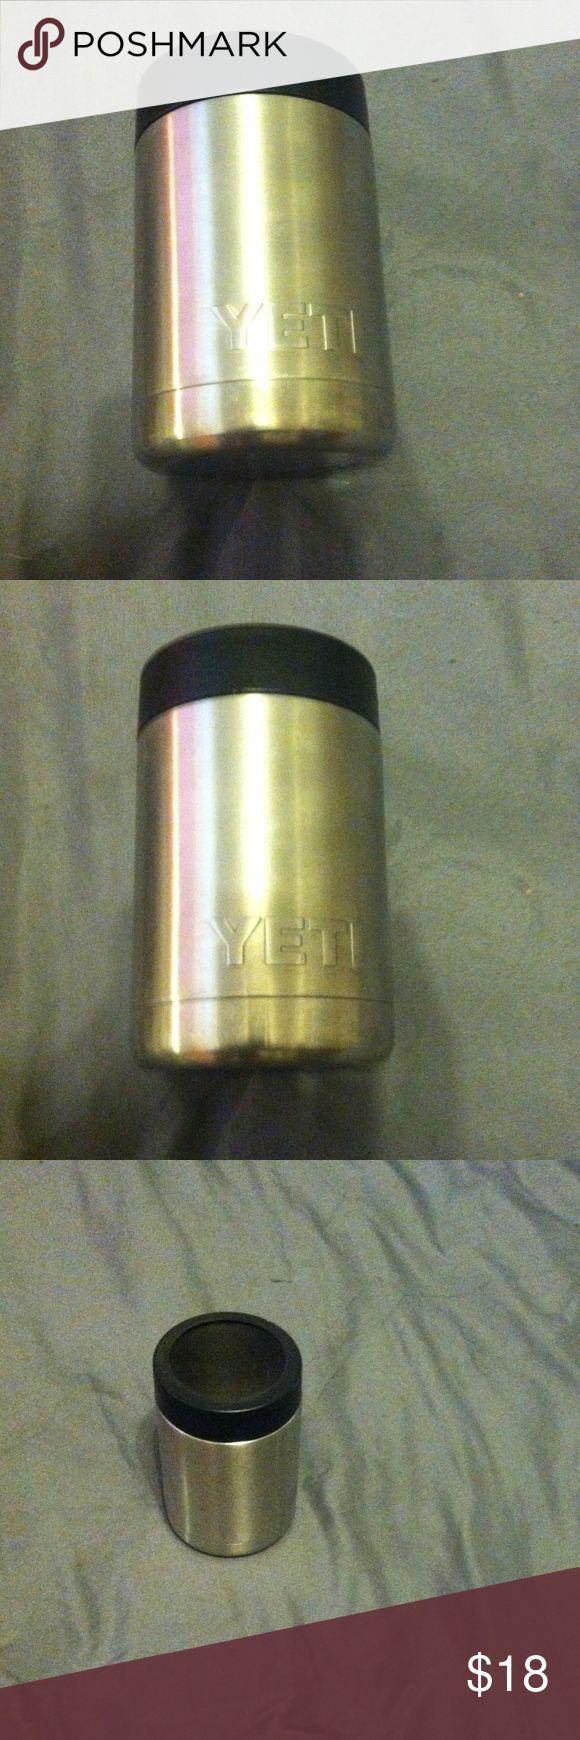 Yeti Coozie never used Brand new yeti Coozie Accessories